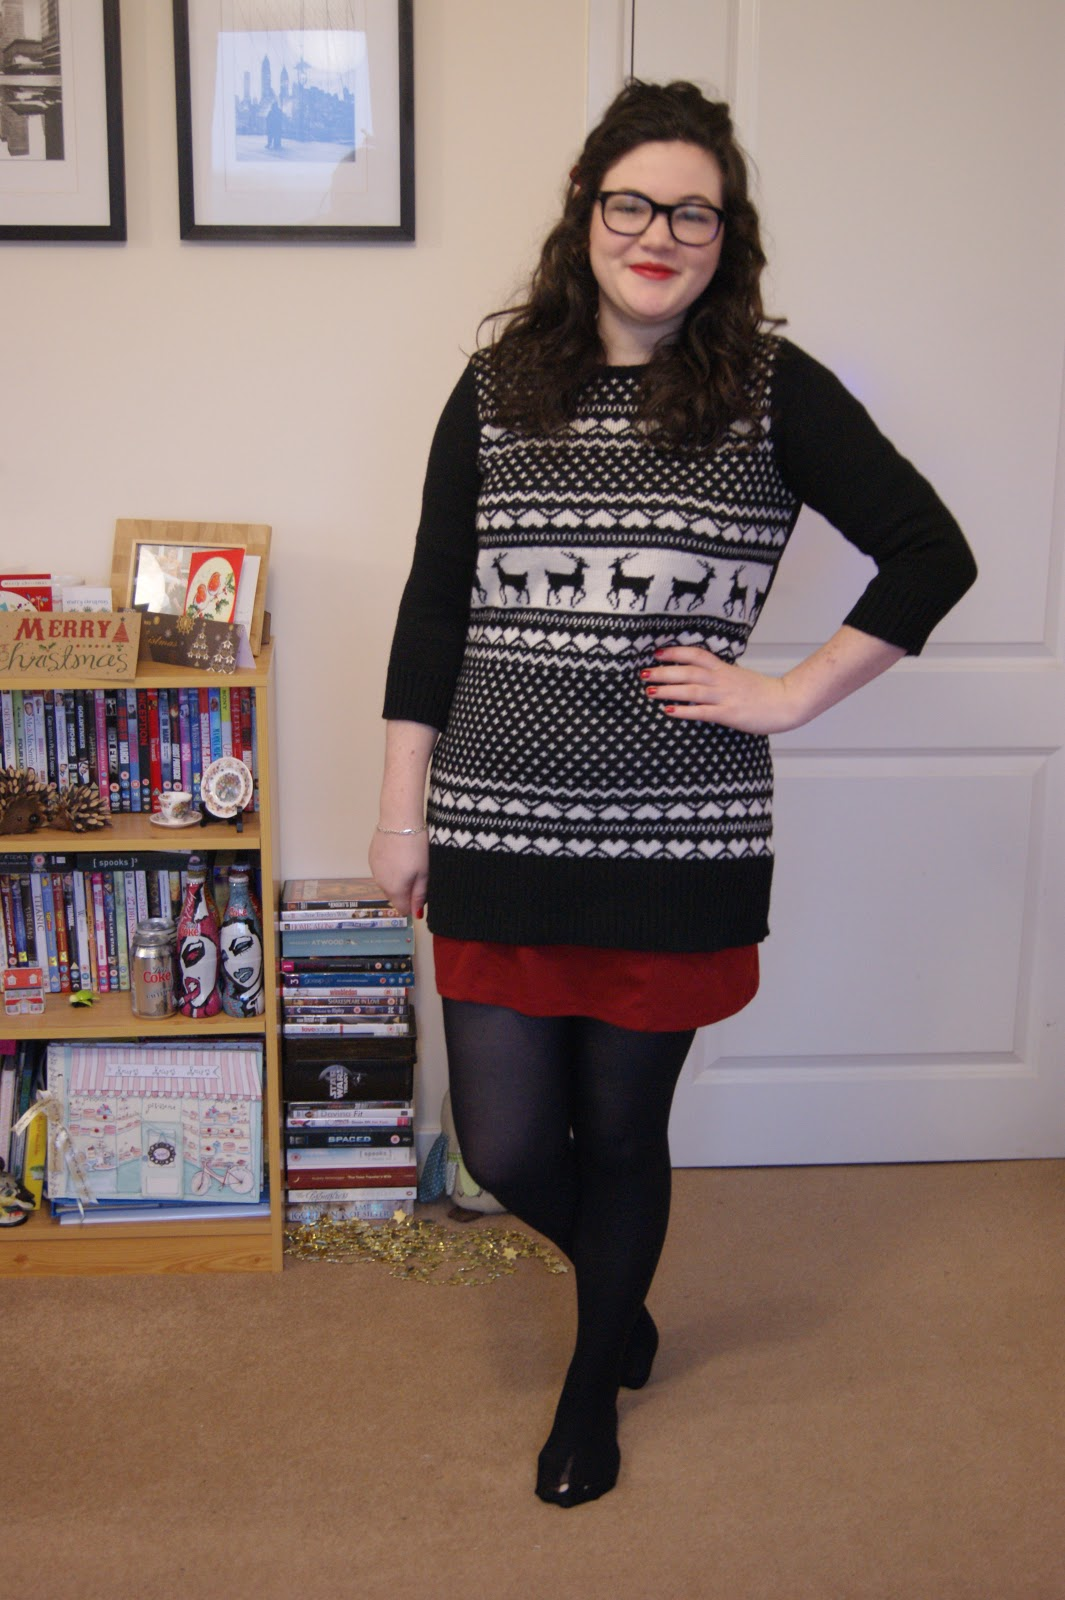 Festive Outfits Frills N Spills